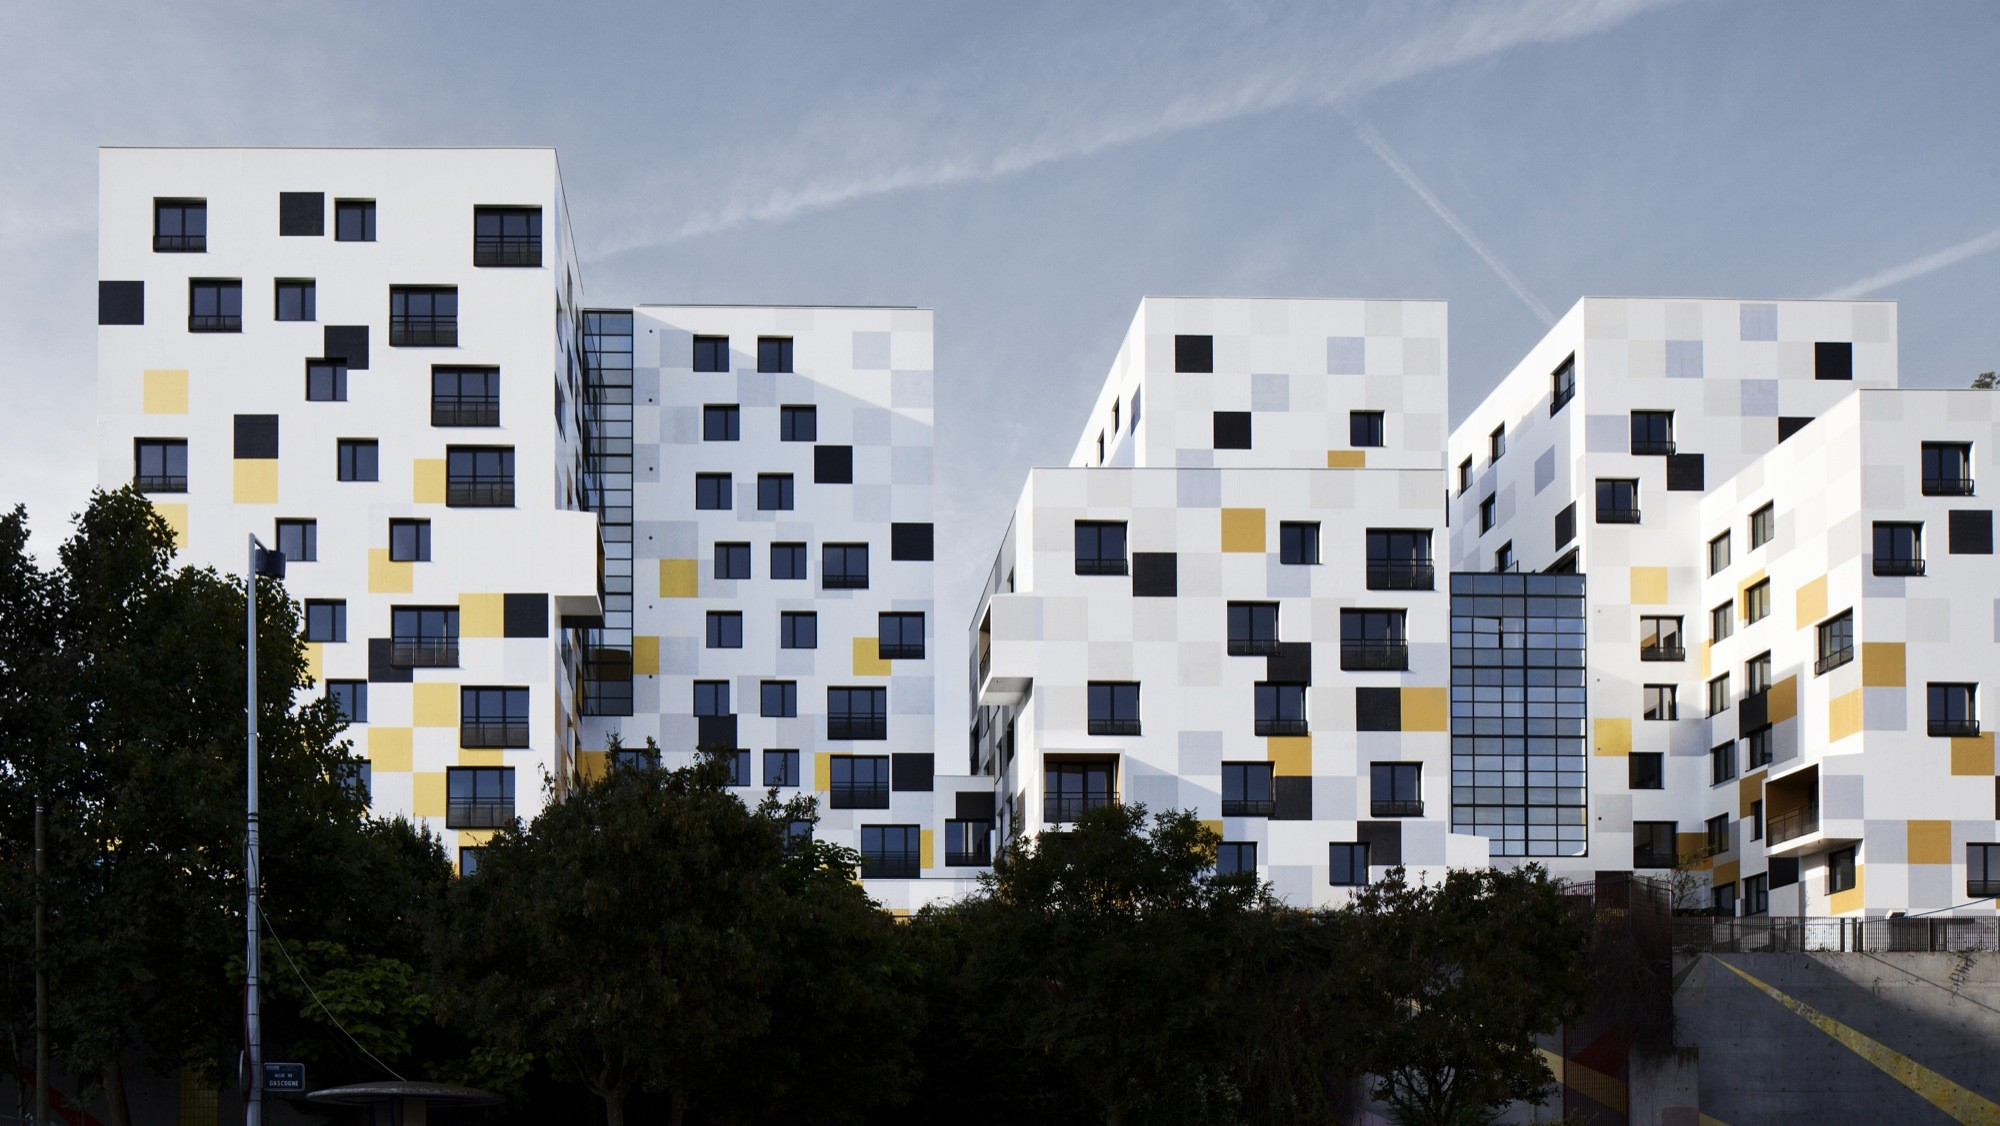 gallery of apartment blocks in nanterre x tu 3. Black Bedroom Furniture Sets. Home Design Ideas